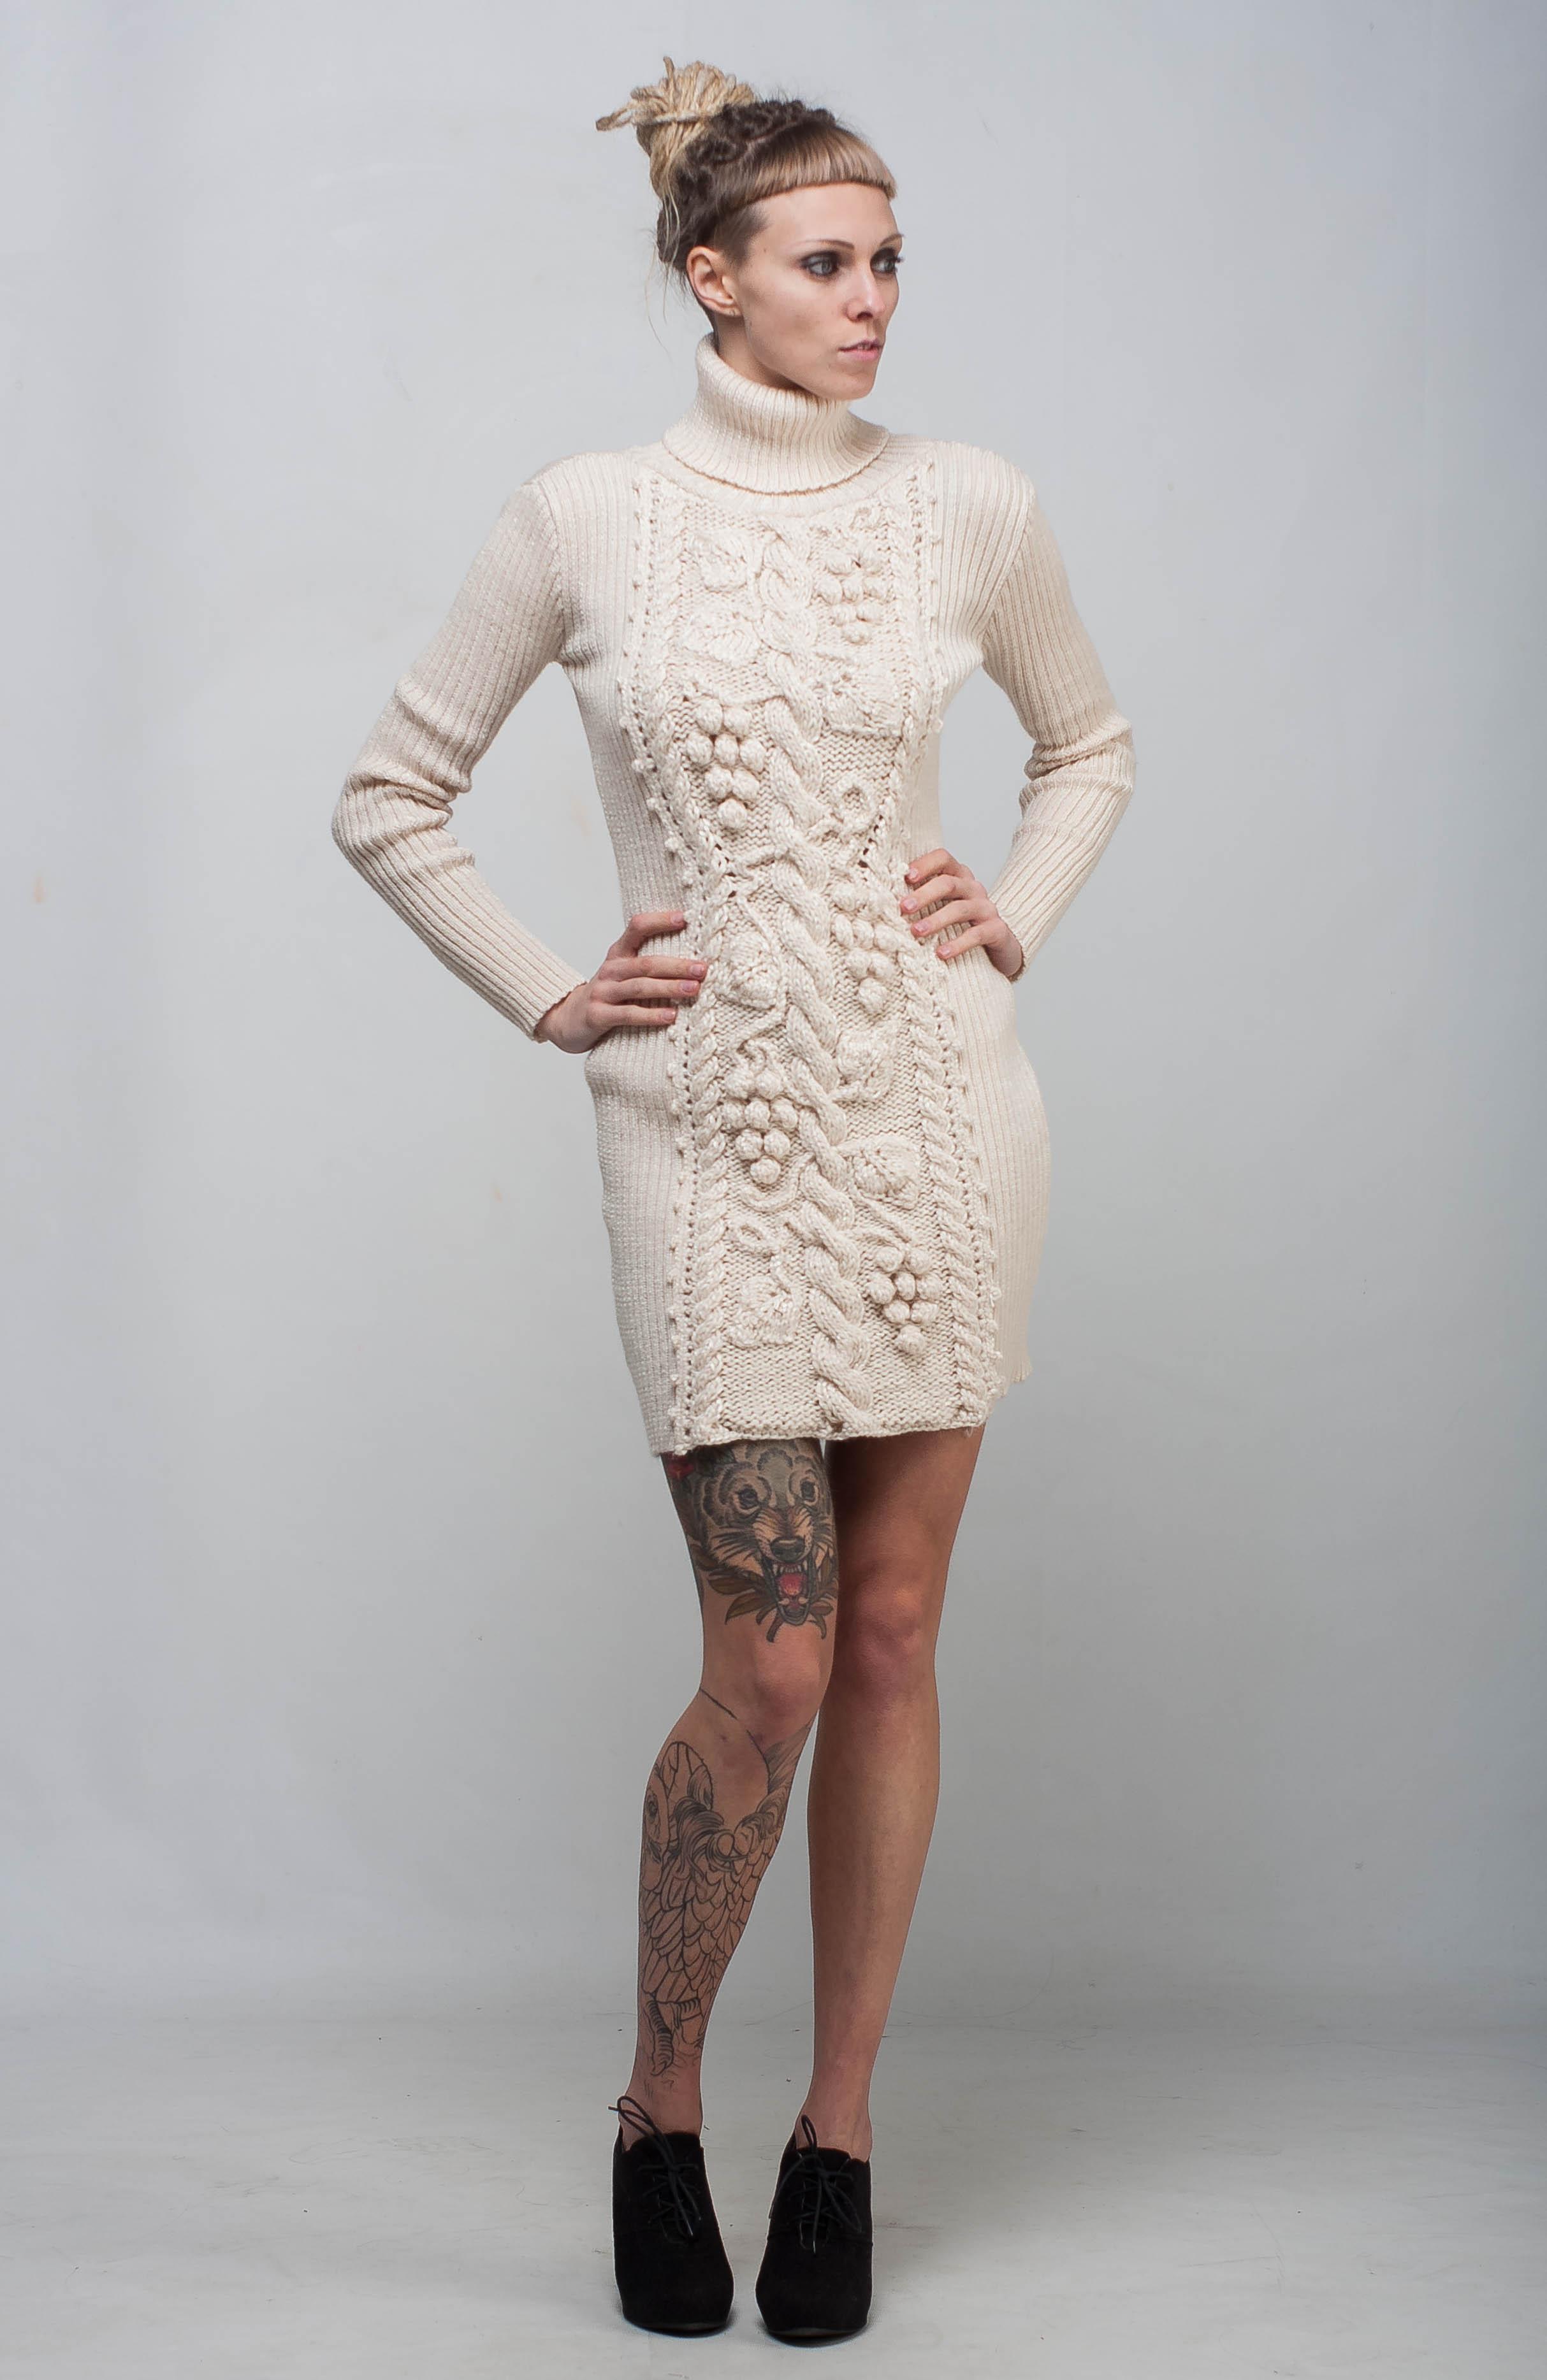 Ivory Cable Knit Dress Sheath White Dress Handmade Winter